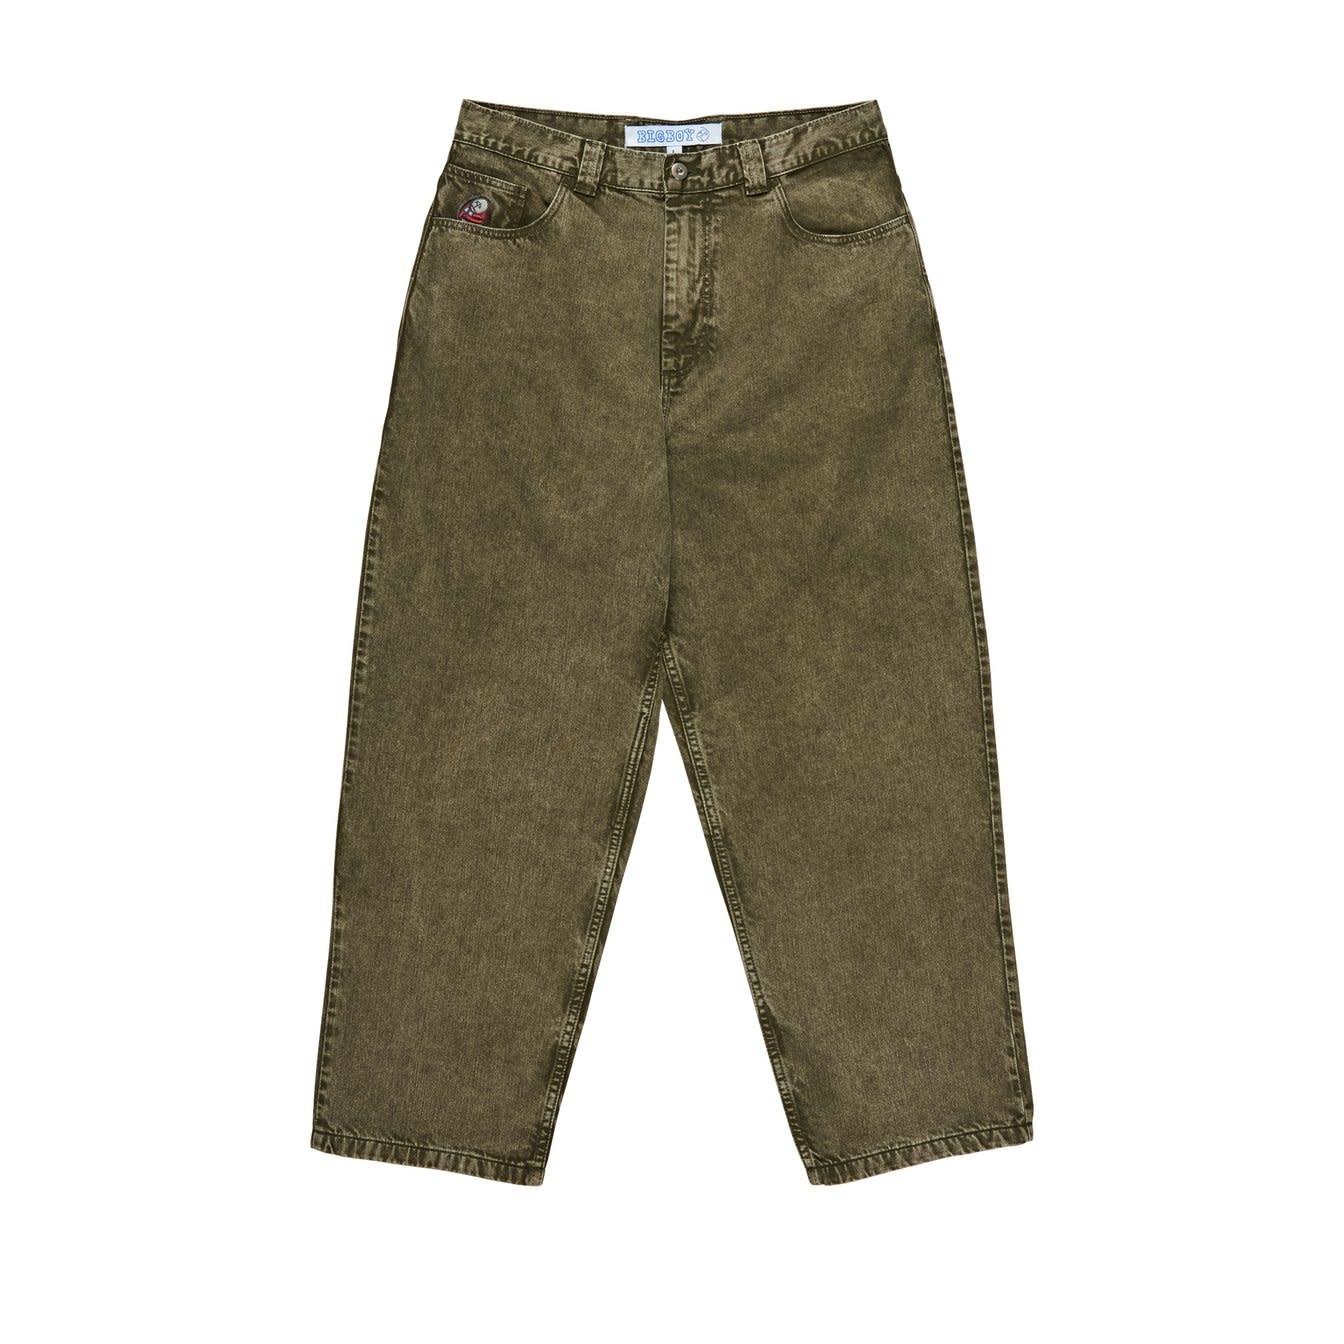 Polar Skate Co. Big Boy Jeans Army Green